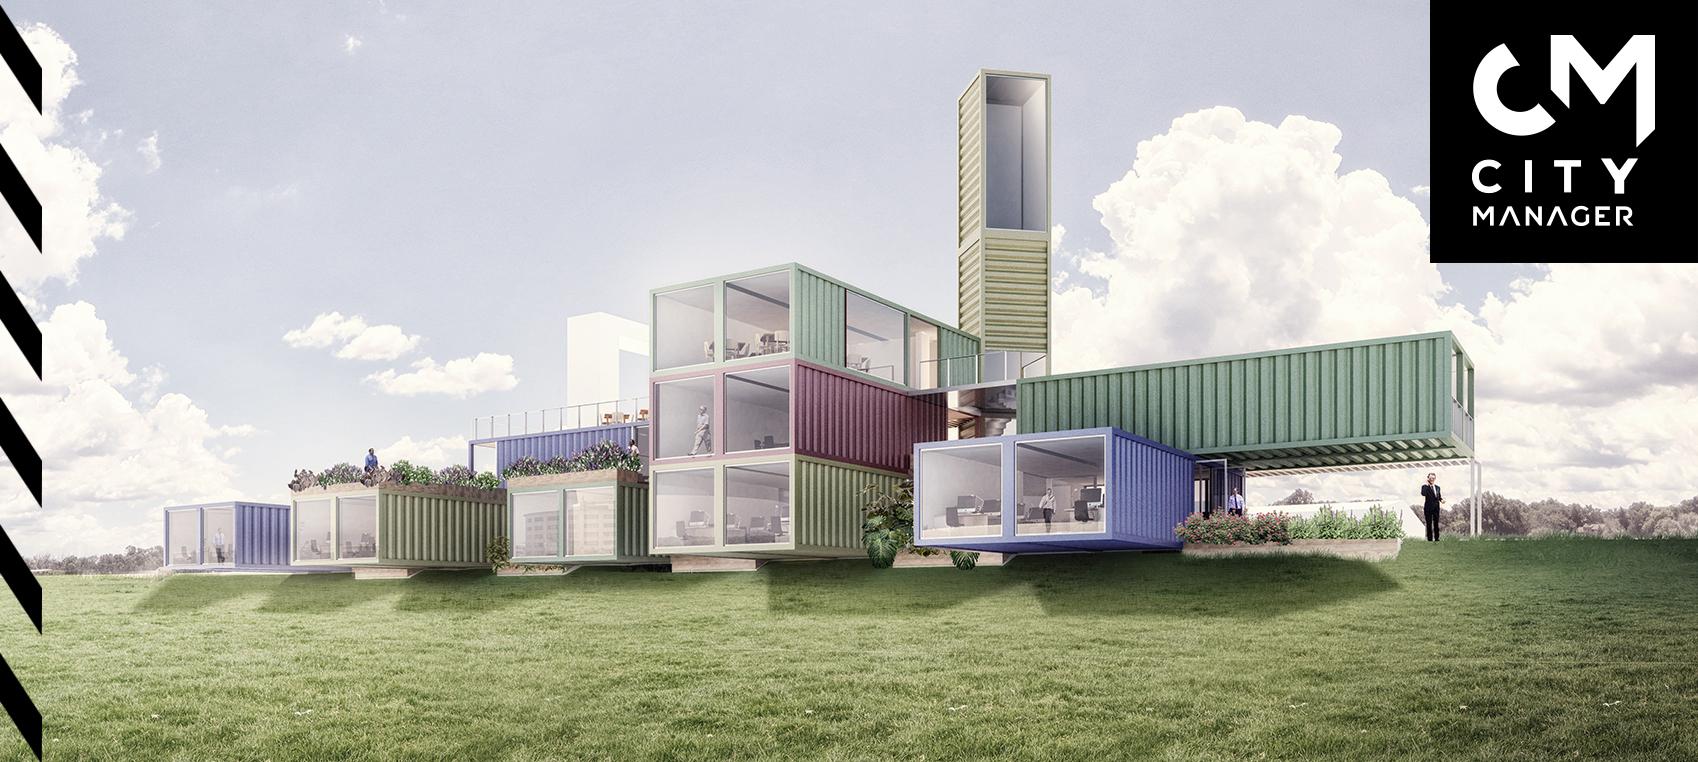 Construir con contenedores marítimos